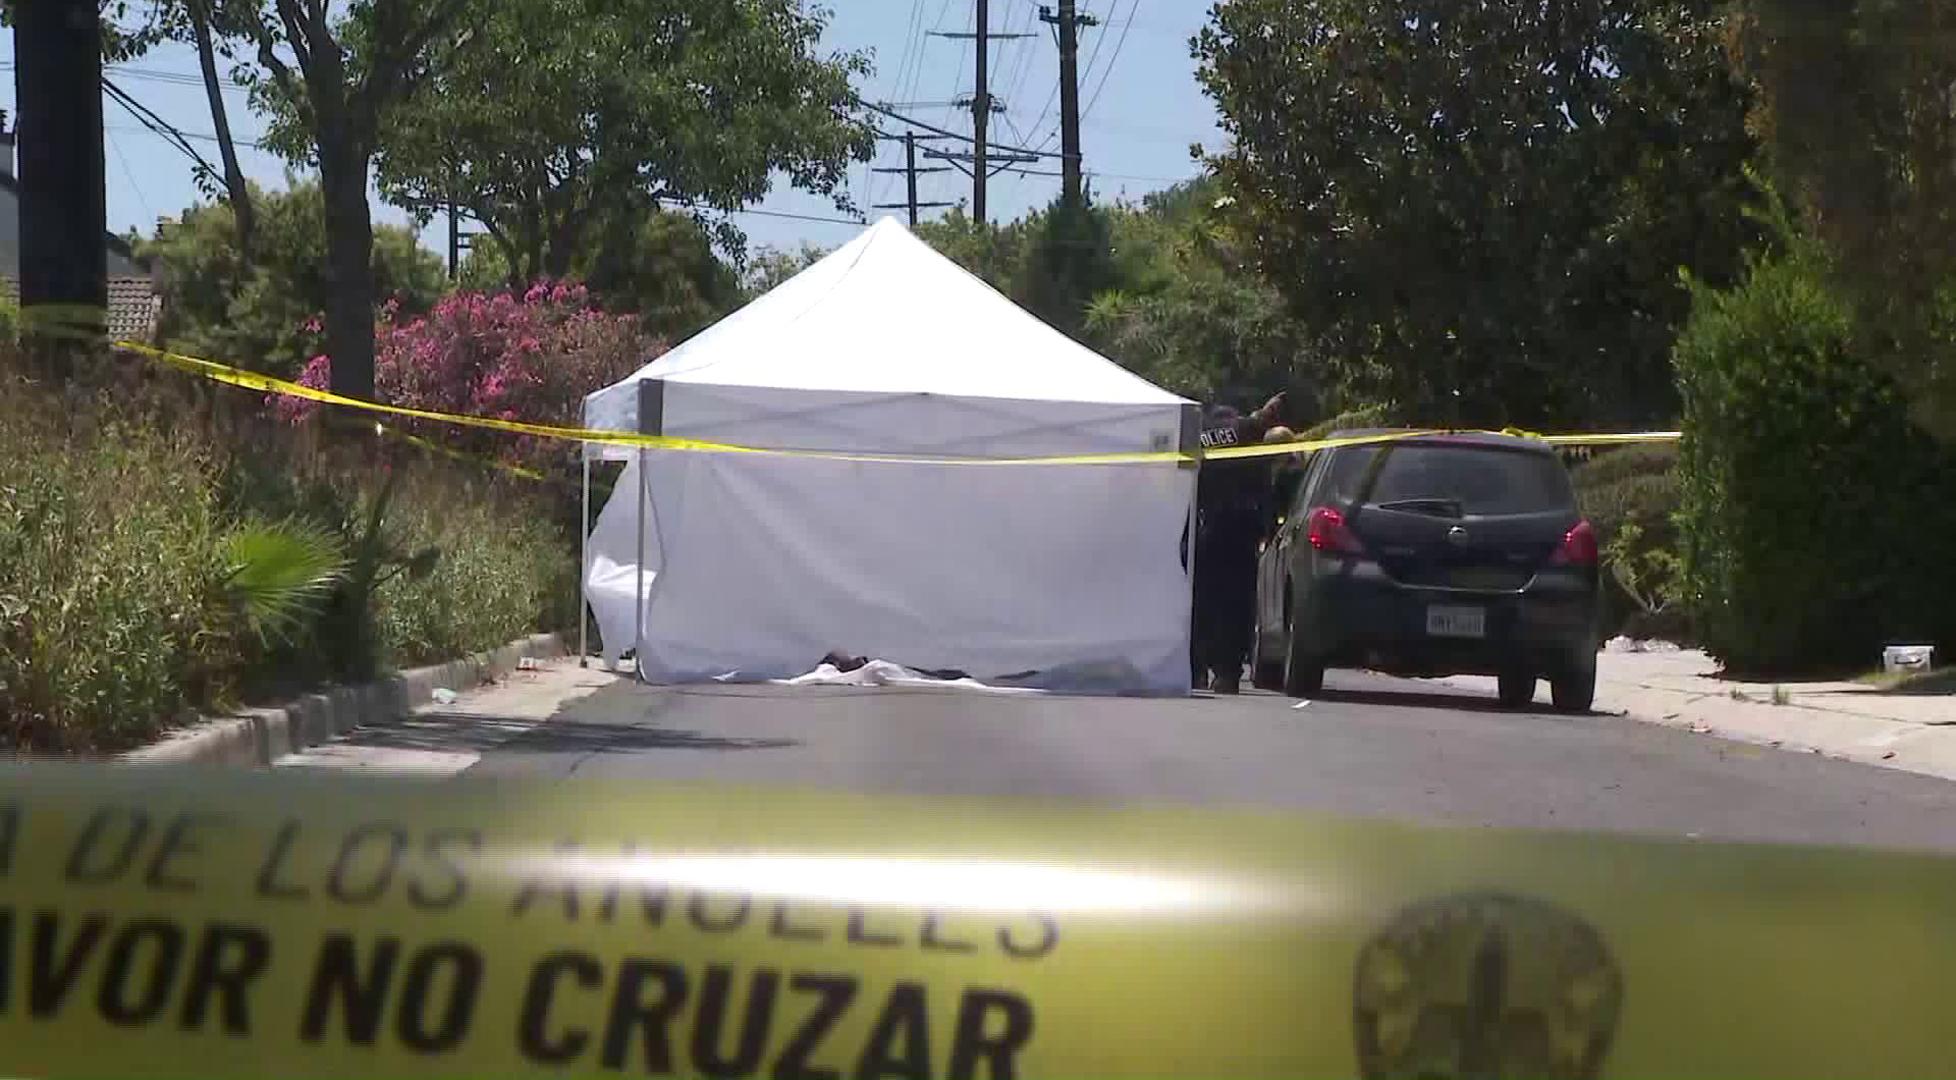 Police investigate the scene of a shooting in Mar Vista on July 15, 2020. (KTLA)